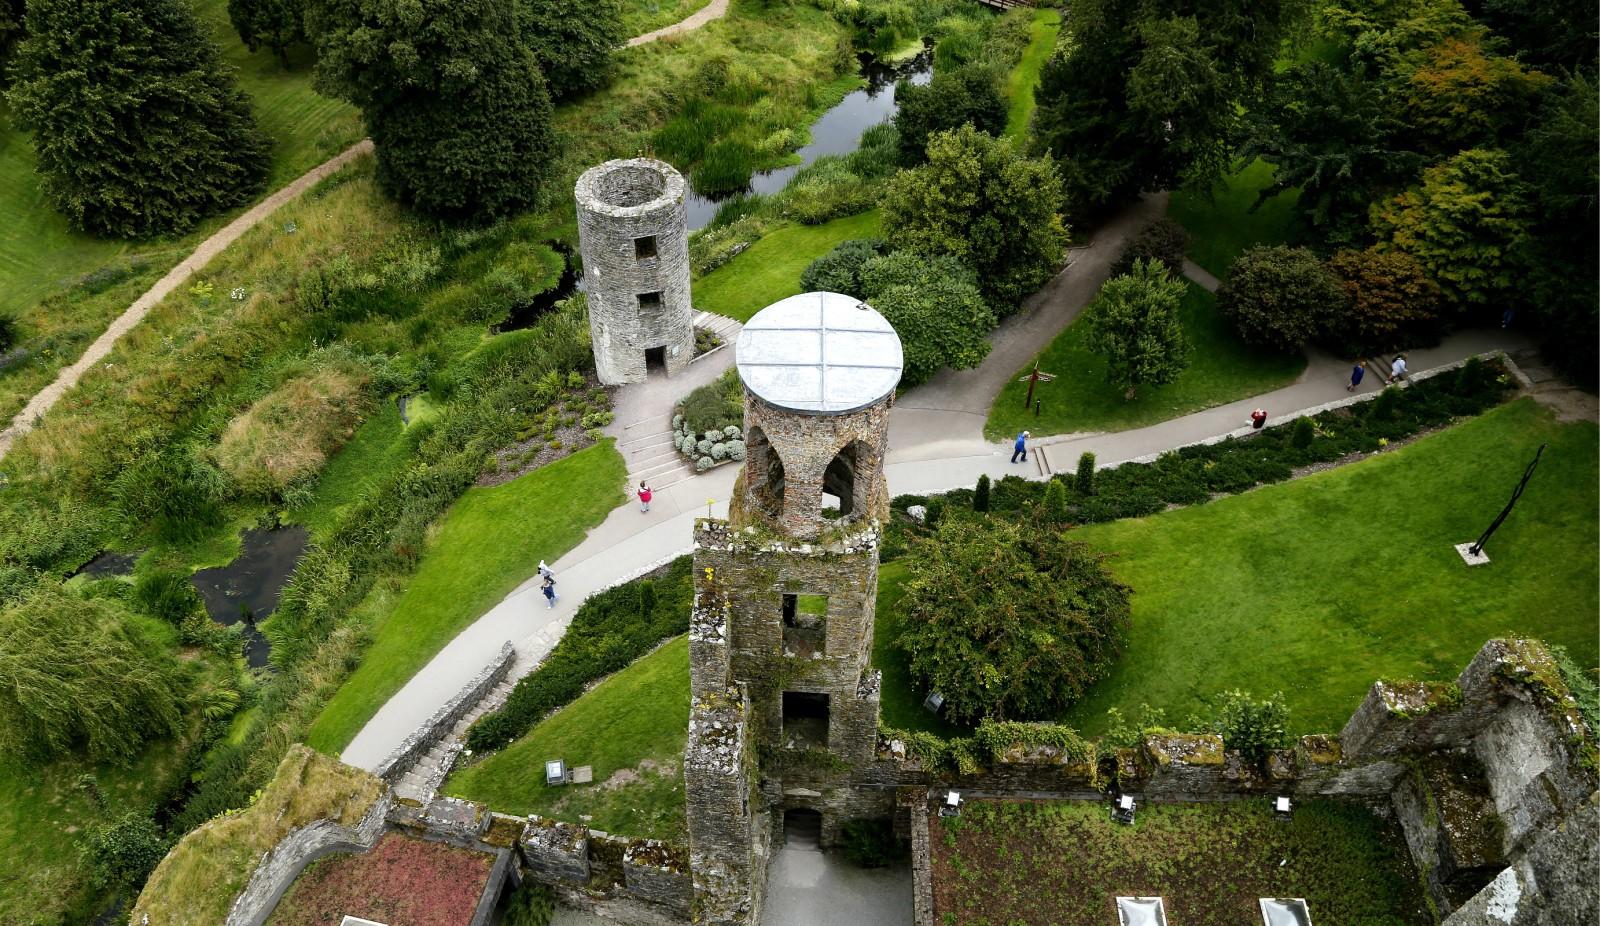 布拉尼城堡(Blarney Castle)